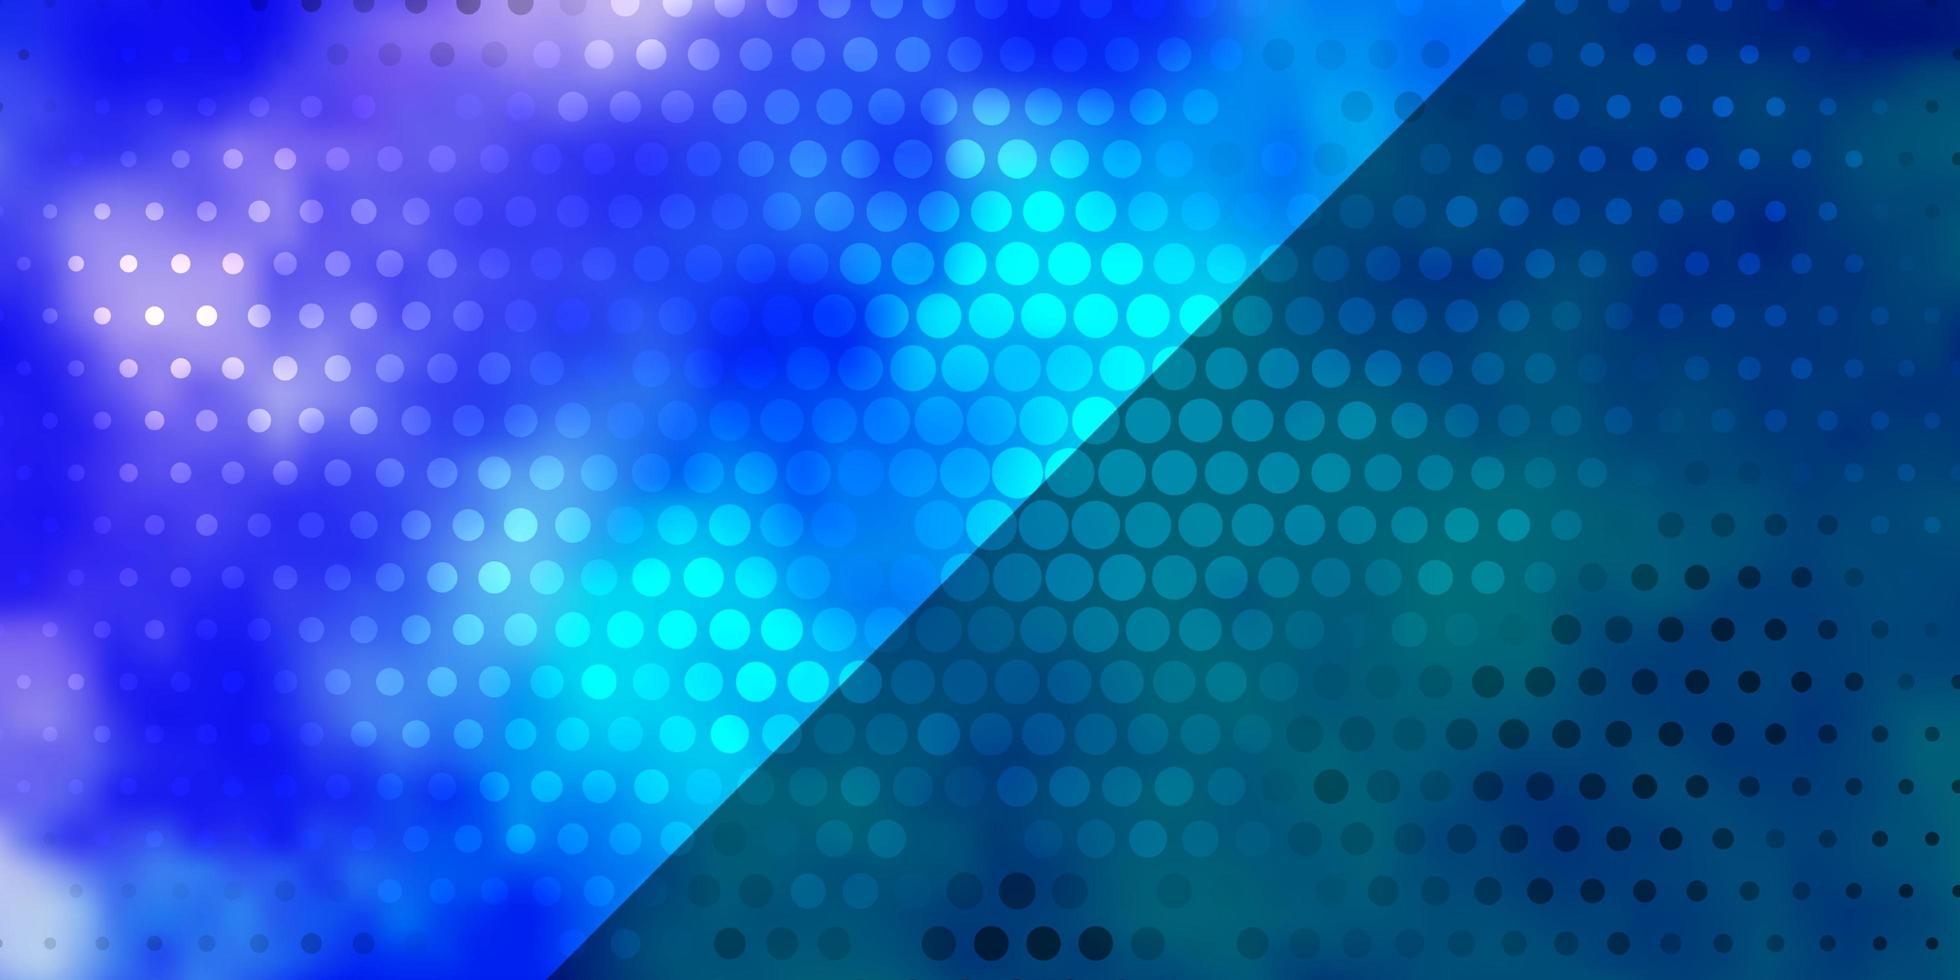 hellrosa, blaues Vektormuster mit Kreisen. vektor